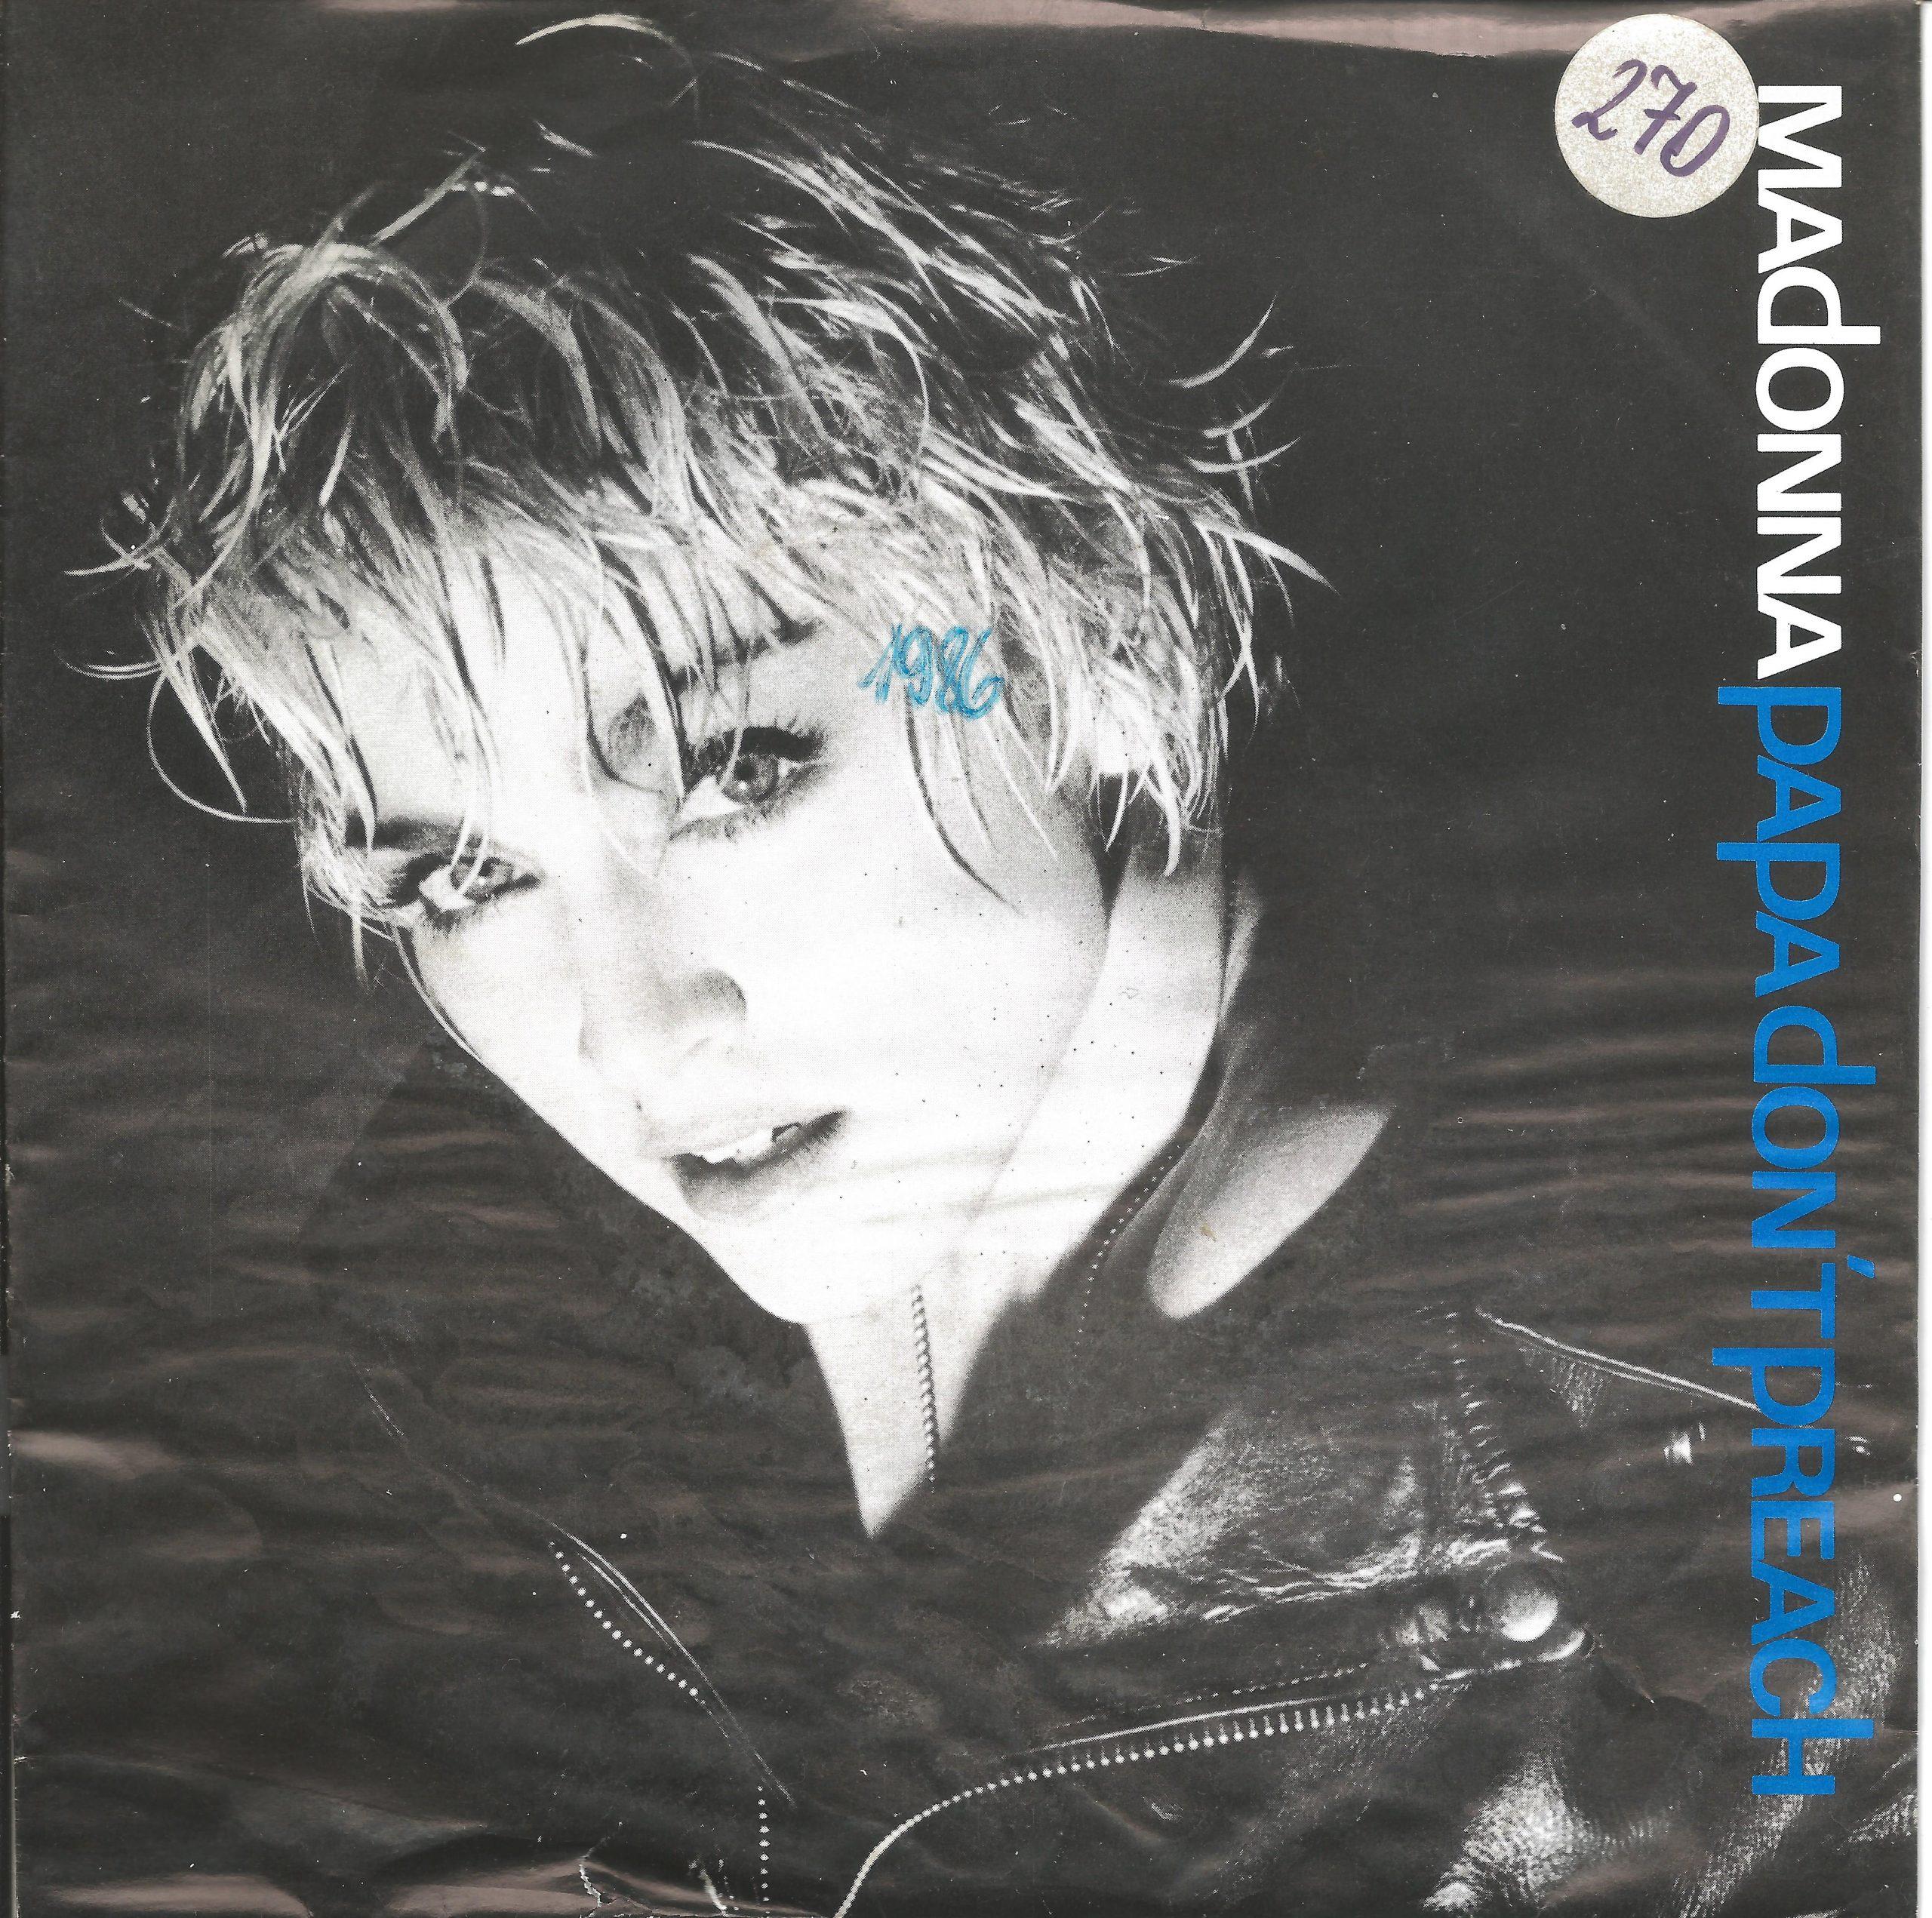 Madonna Papa dont preach 1986